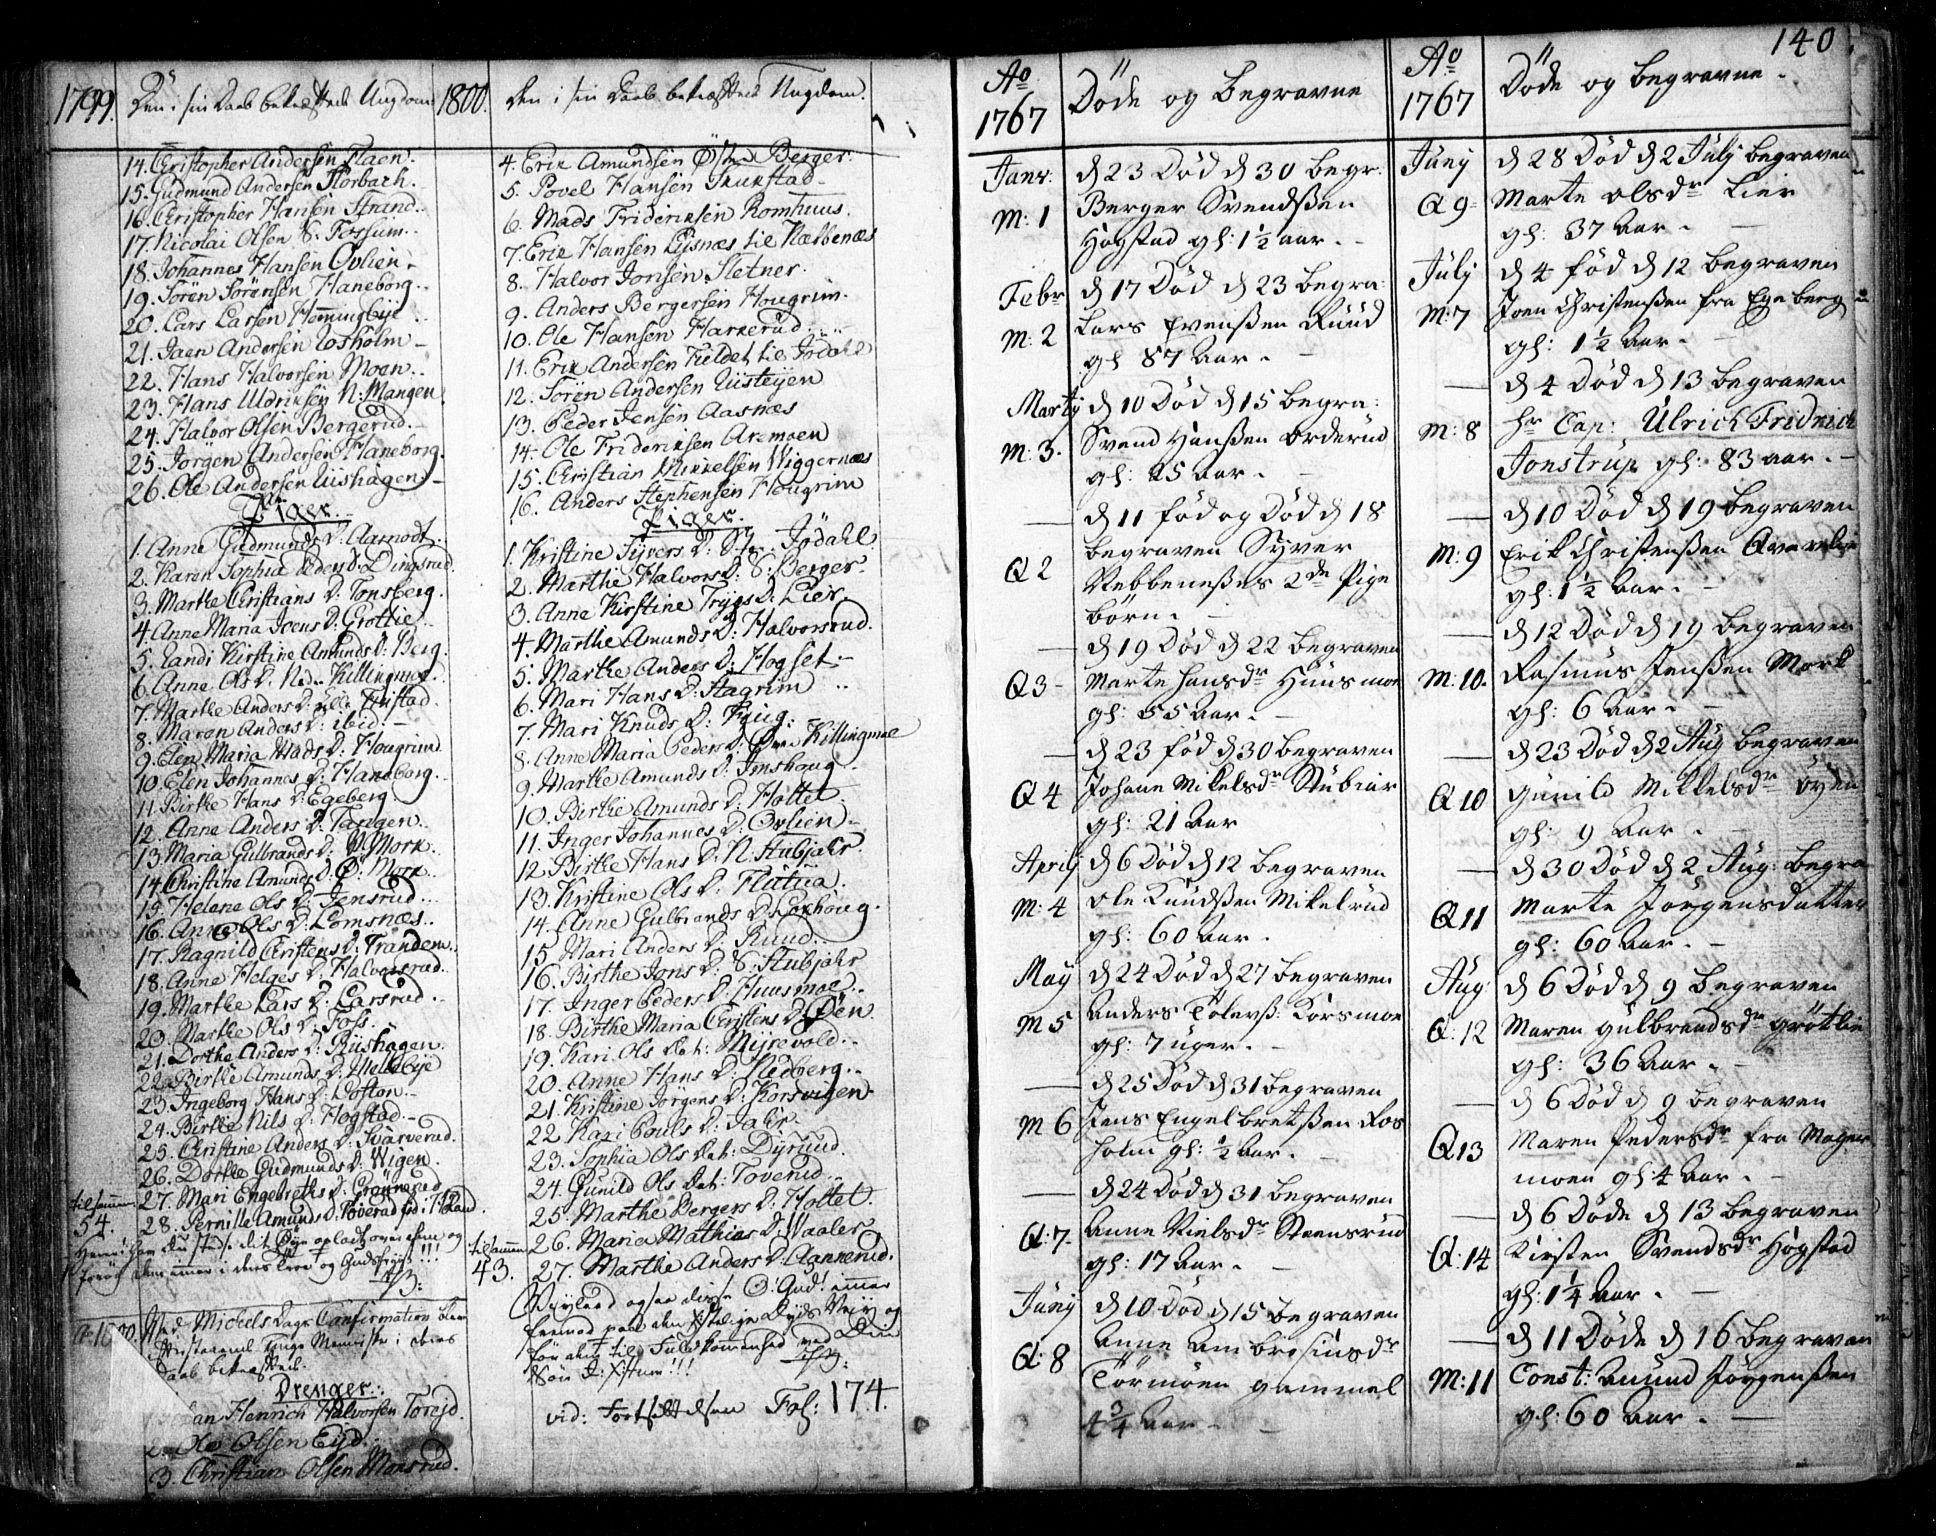 SAO, Aurskog prestekontor Kirkebøker, F/Fa/L0003: Ministerialbok nr. I 3, 1767-1807, s. 140